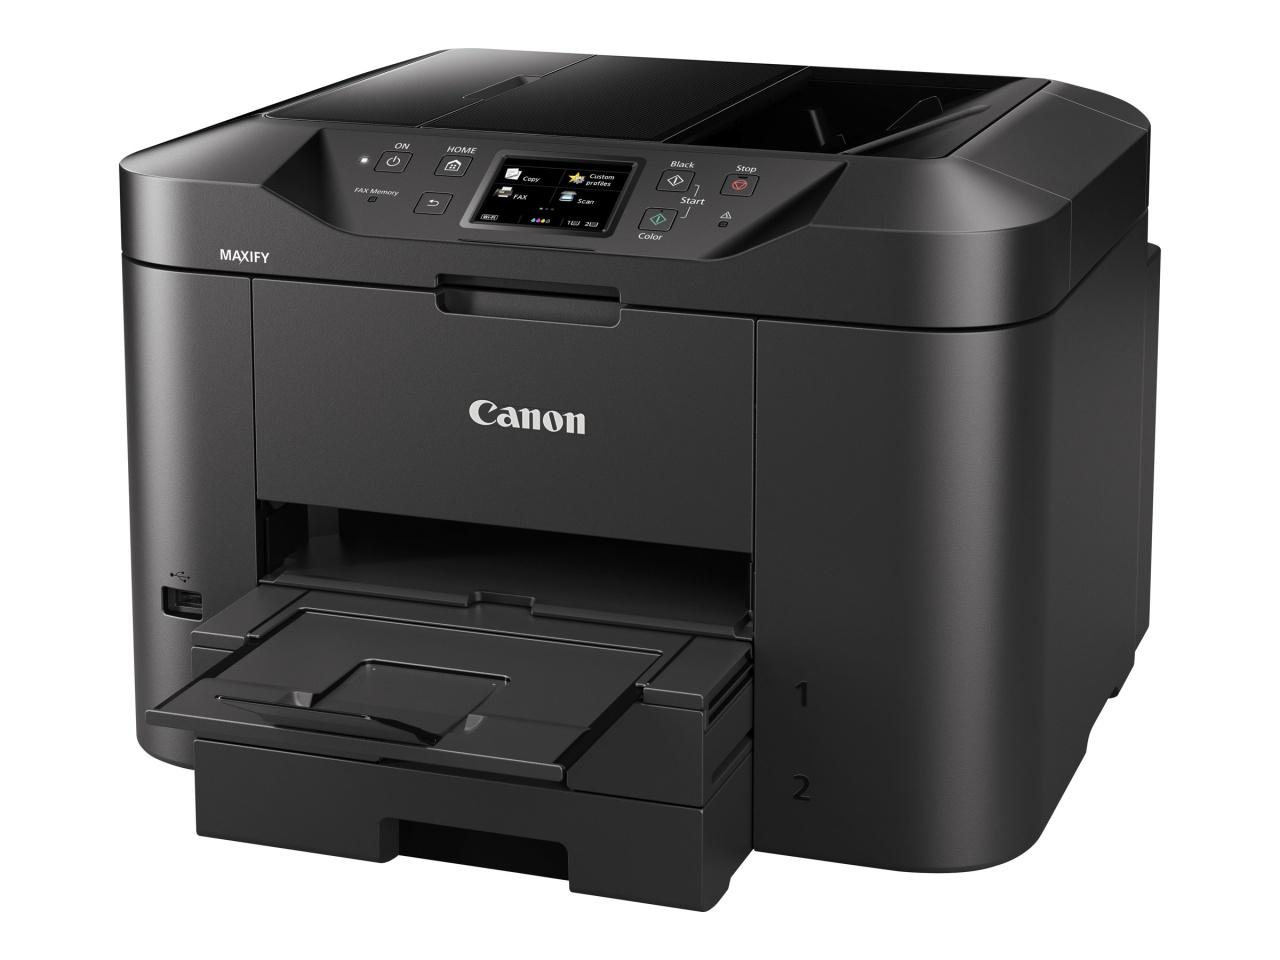 Canon MAXIFY MB2750 4-in-1 Tinten-Multifunktionsdrucker